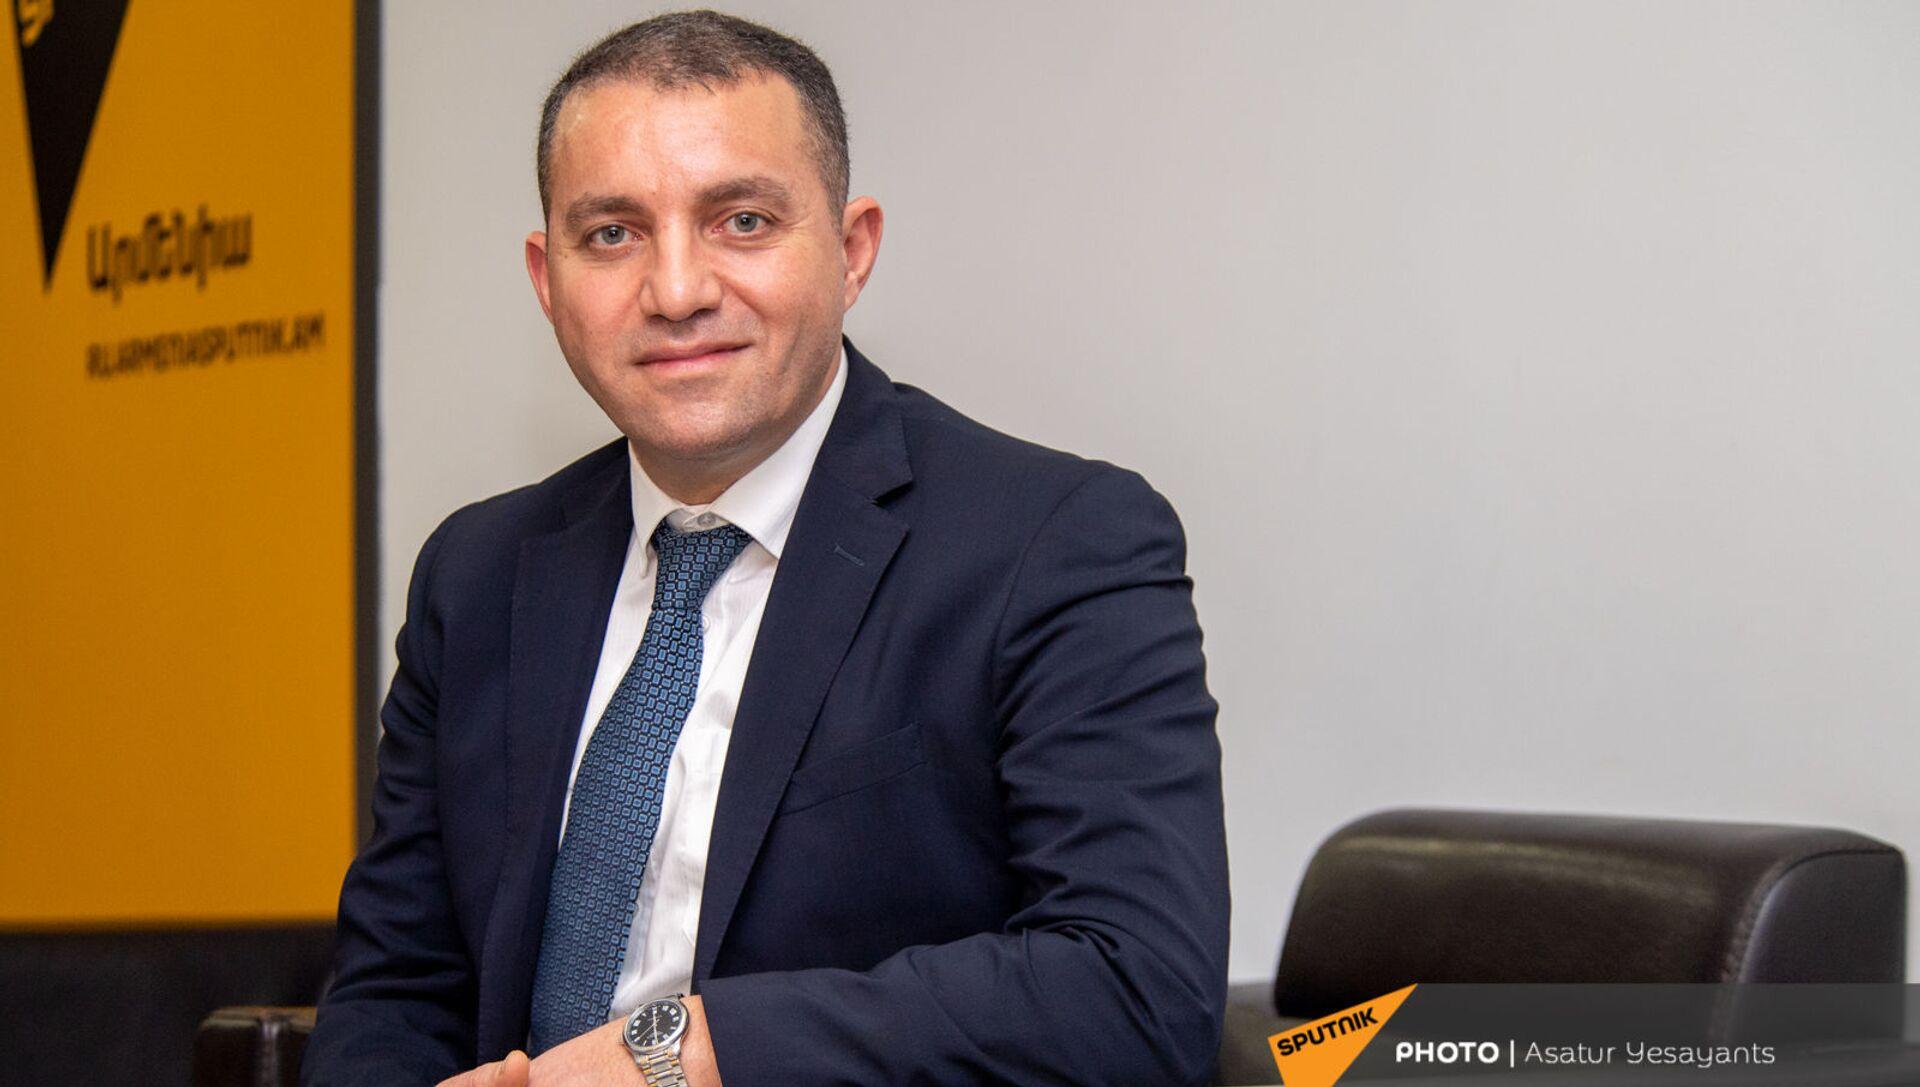 Министр экономики Ваан Керобян в гостях радио Sputnik - Sputnik Արմենիա, 1920, 22.06.2021